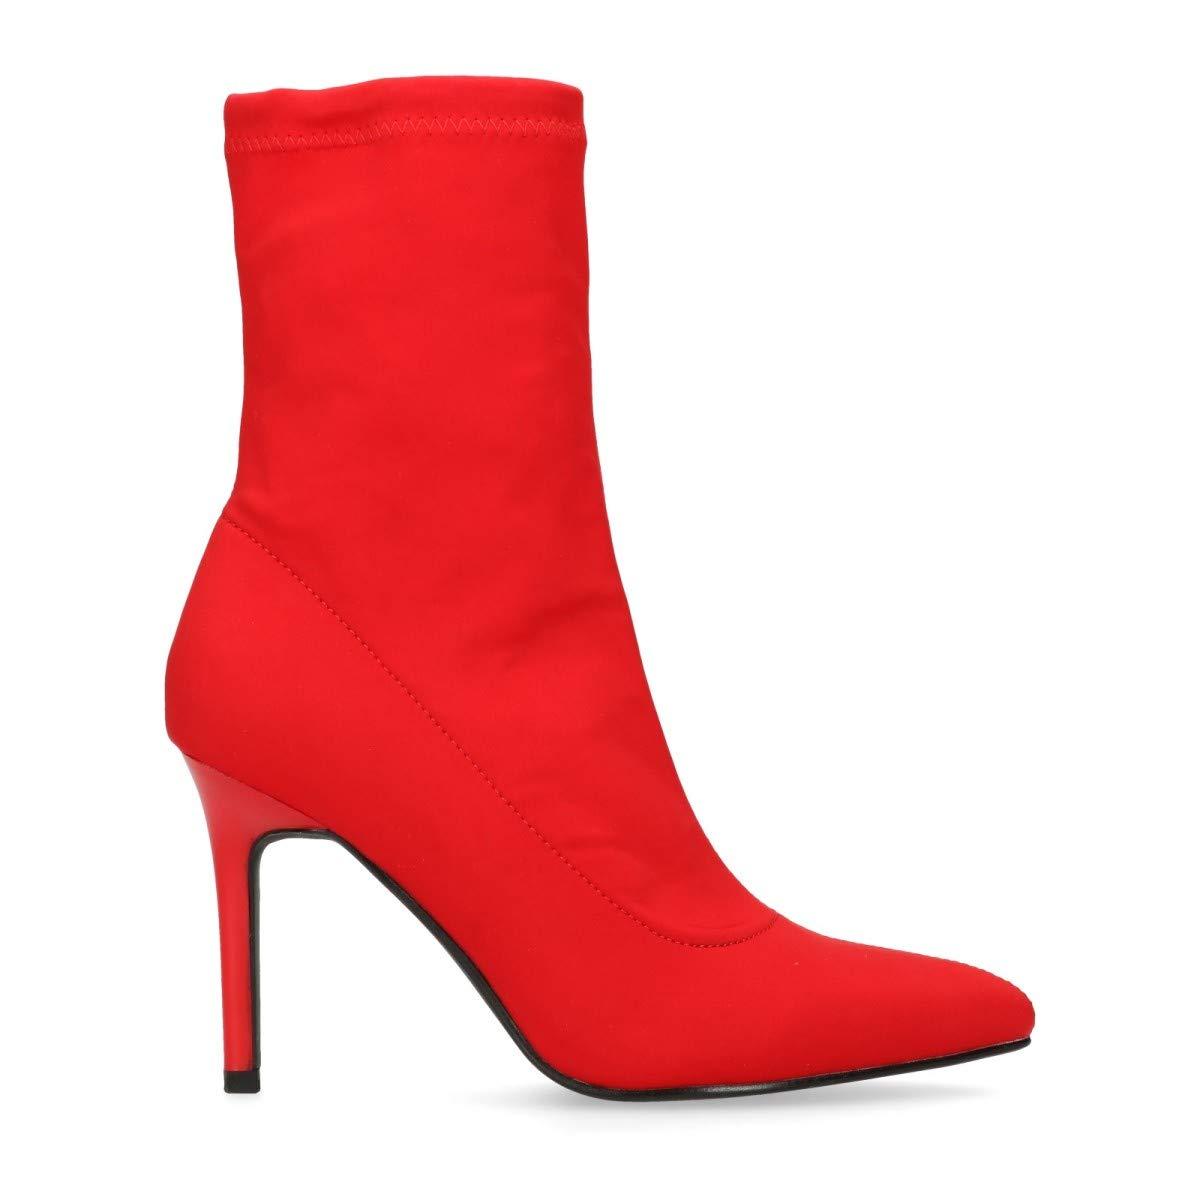 Sacha Schuhe   Damen Stiefeletten   Sock Stiefel   Leder   Farbe  Schwarz